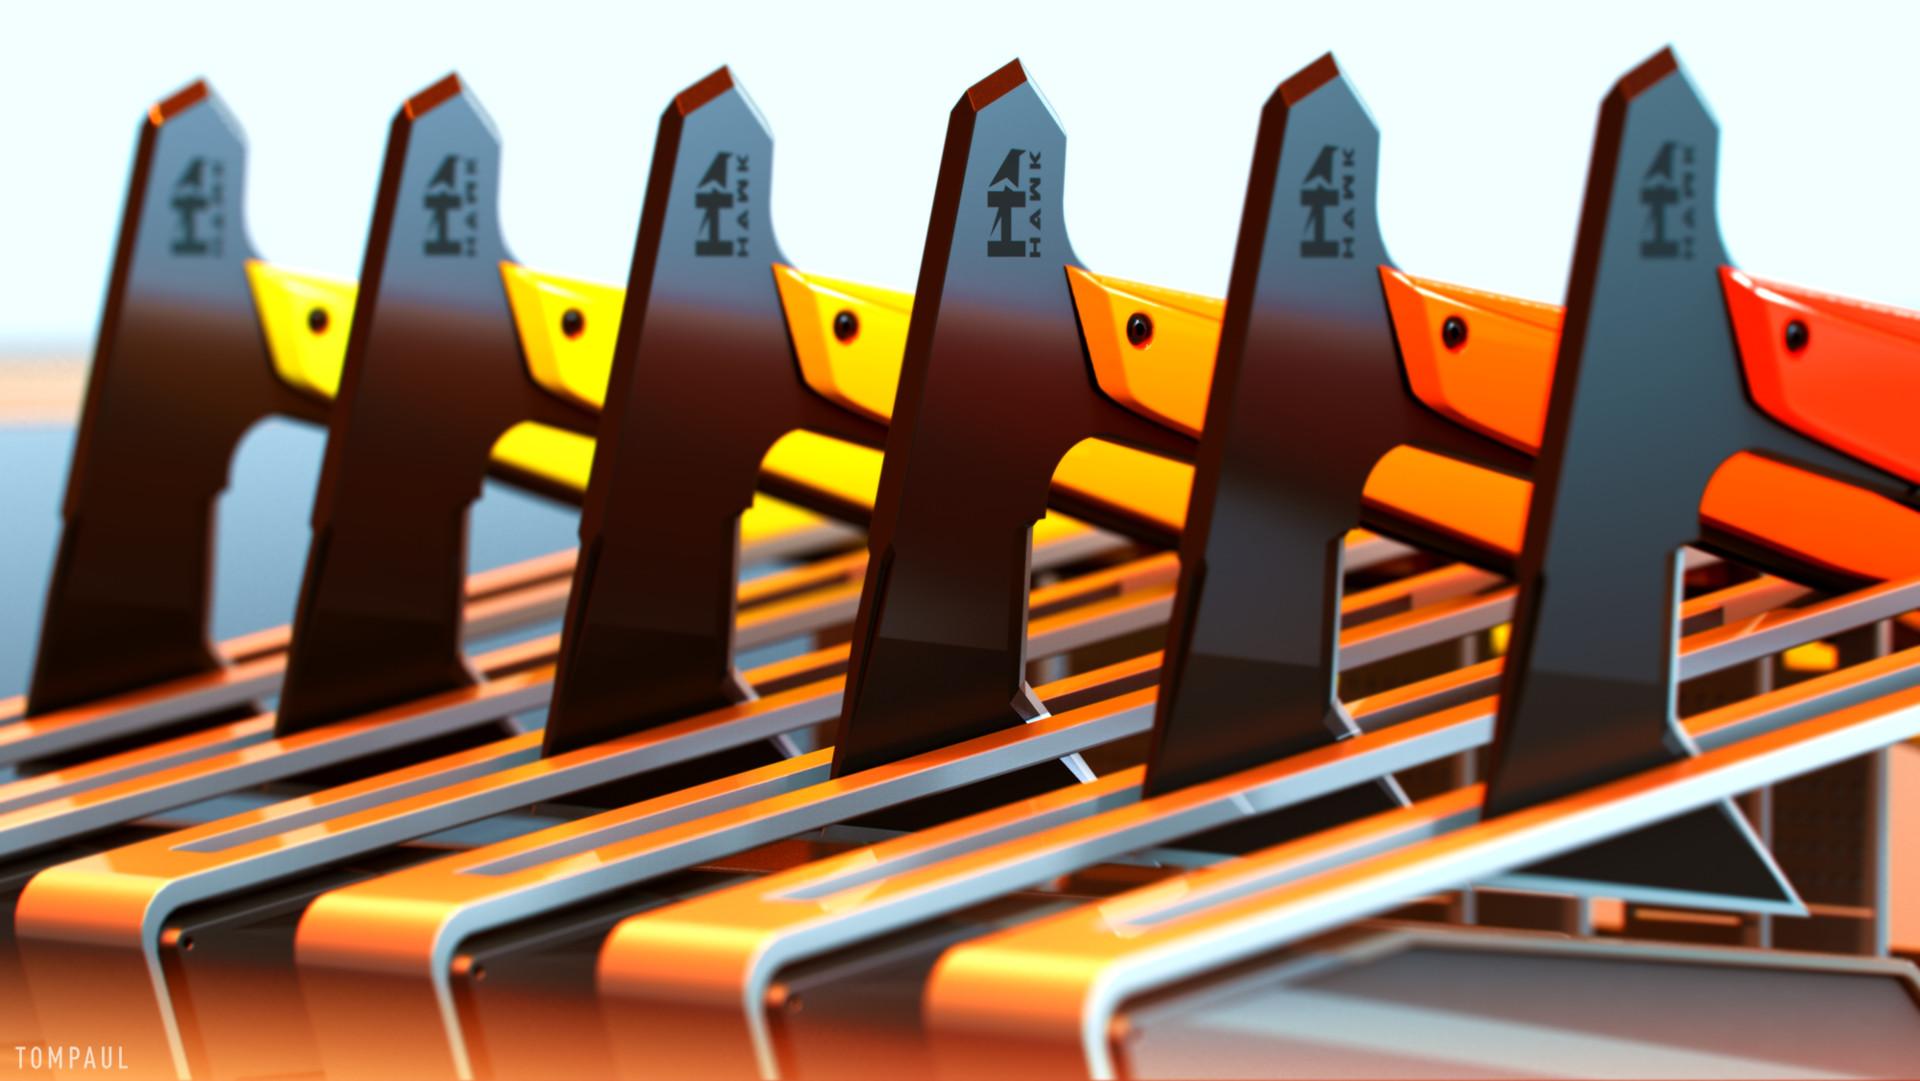 Tom paul hawk rack blades